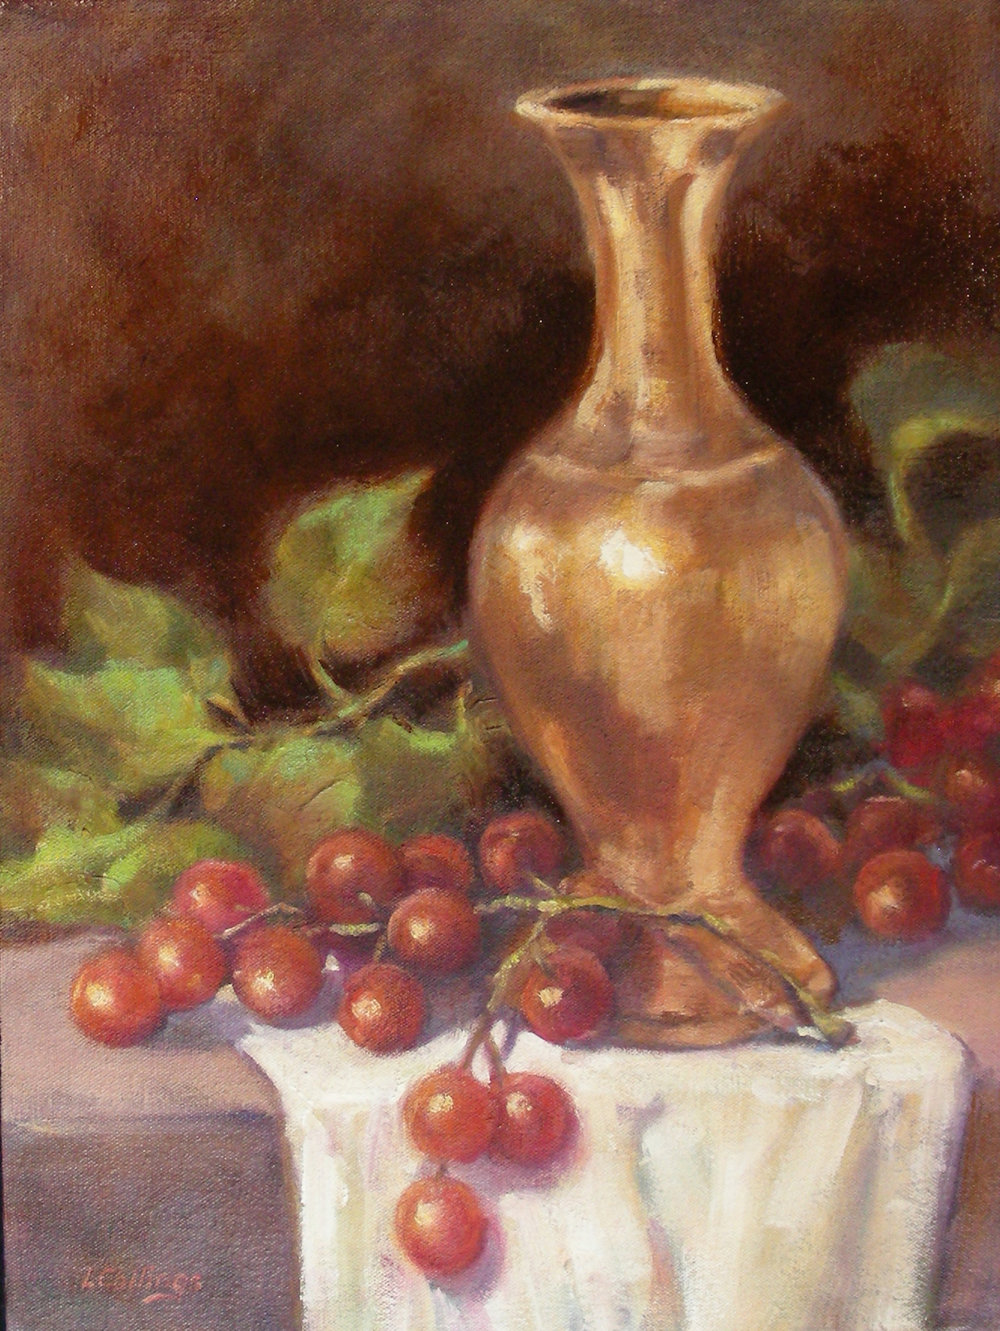 "12 - Copper Vase - 16 x 12"", oil on canvas, $330-"